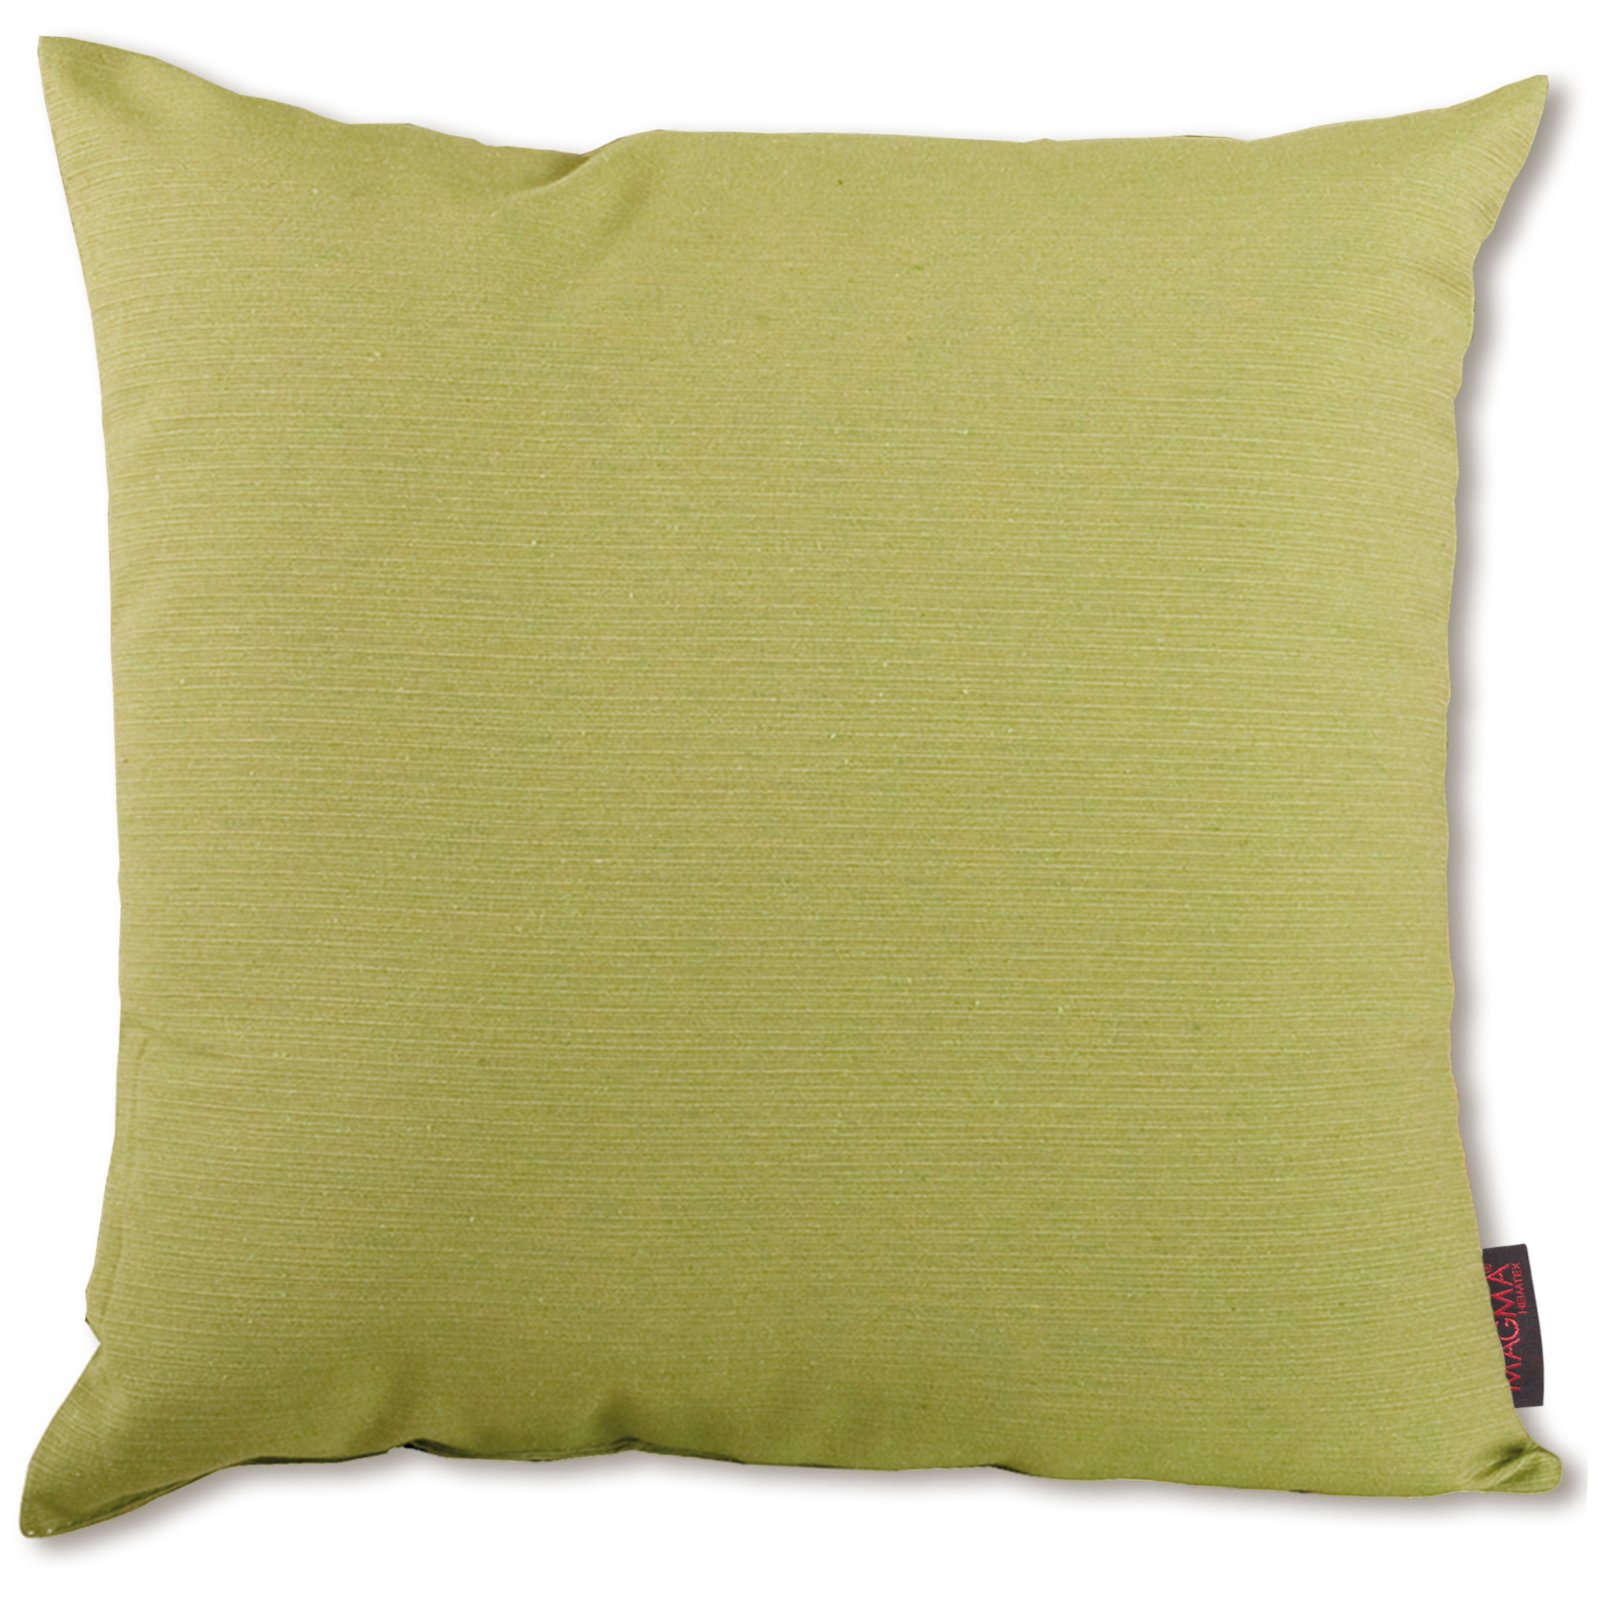 kissen fino gr n 50x50 cm sofakissen kissen deko. Black Bedroom Furniture Sets. Home Design Ideas